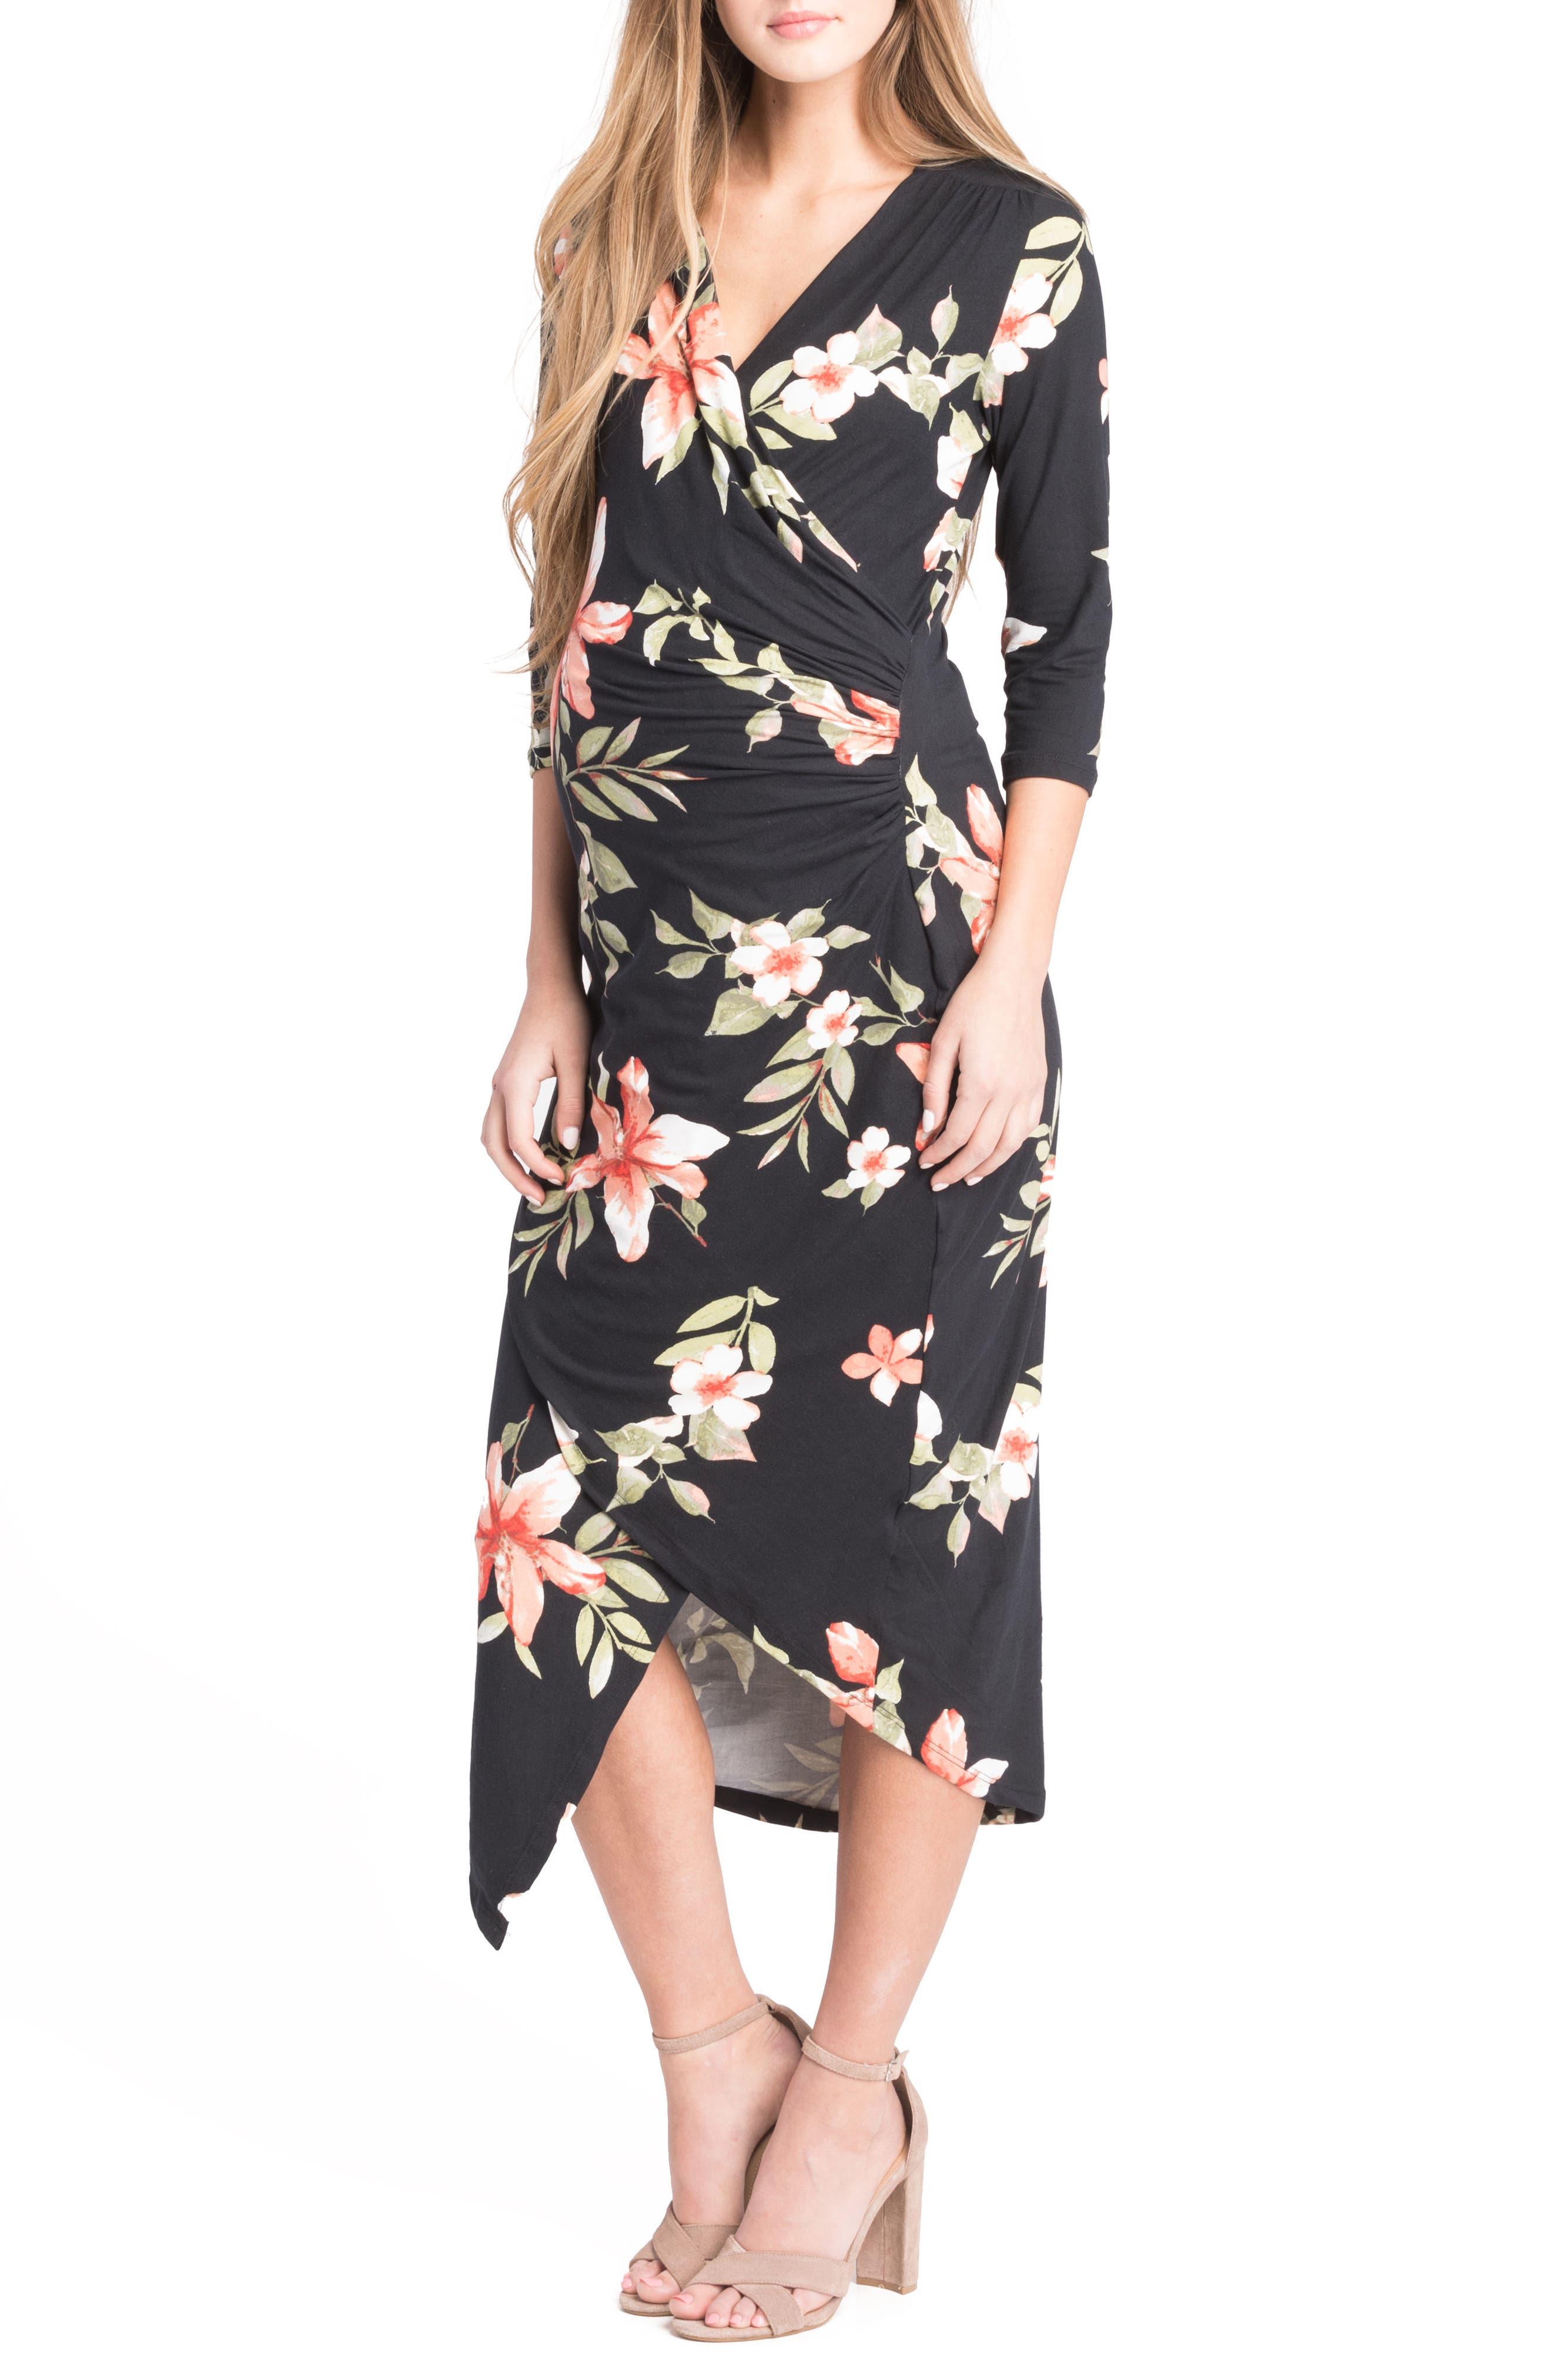 Lilac Clothing Asymmetrical Surplice Maternity/Nursing Dress